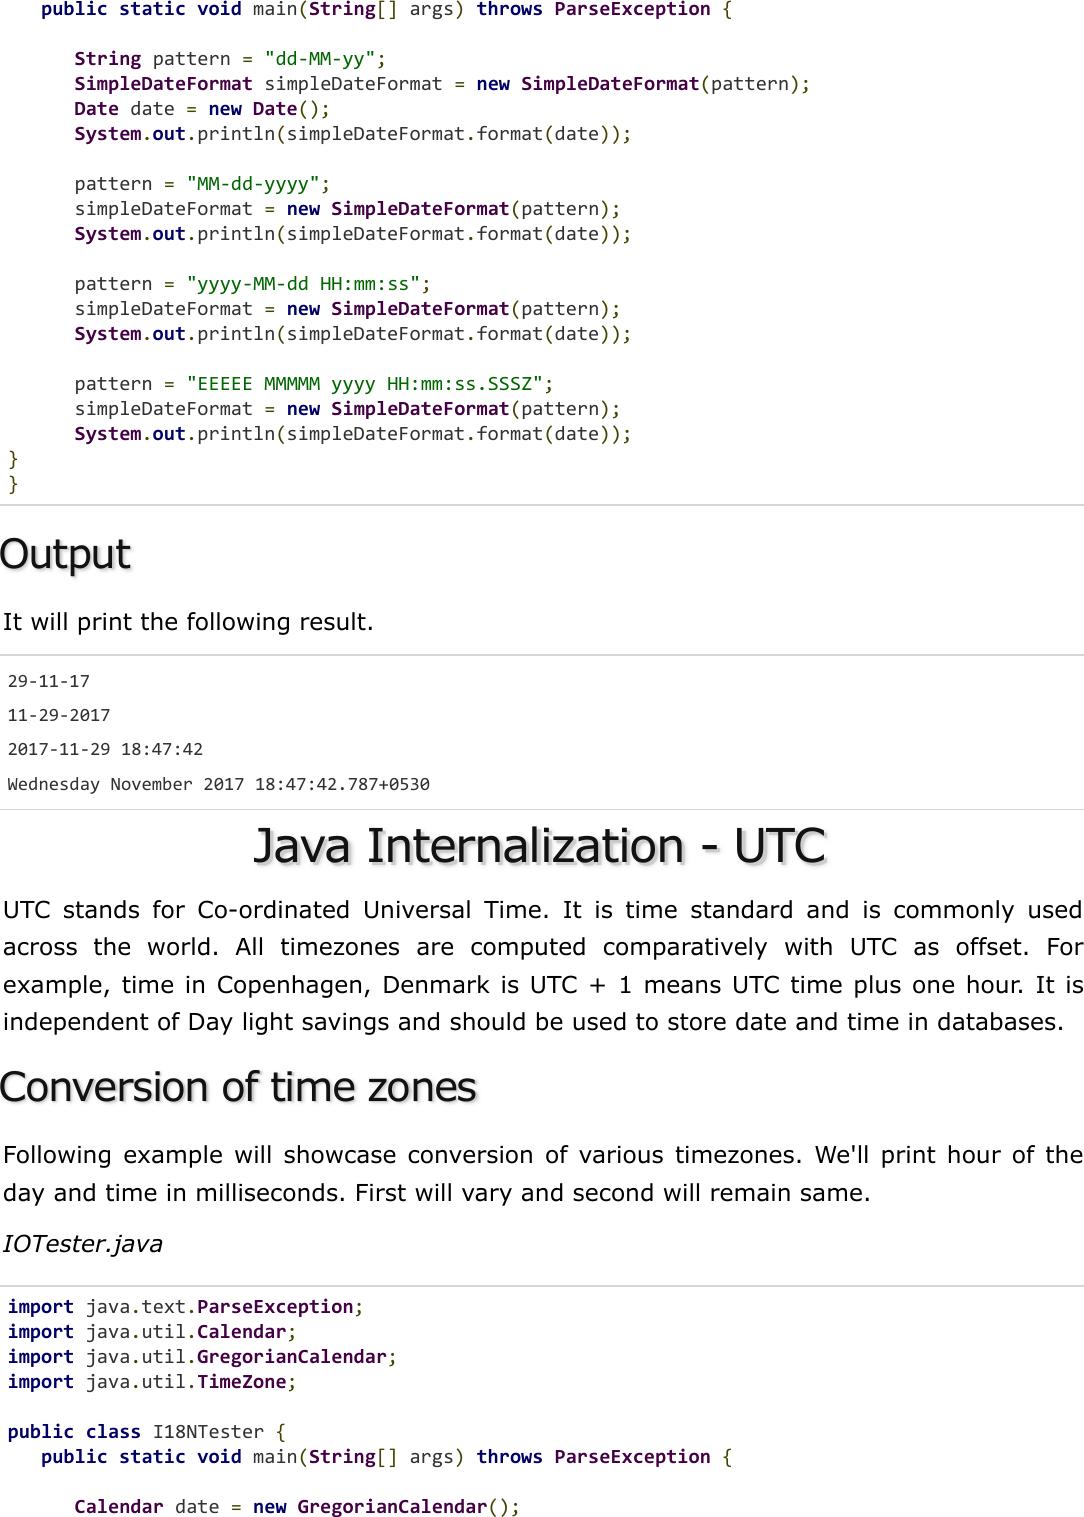 Java Internalization Quick Guide